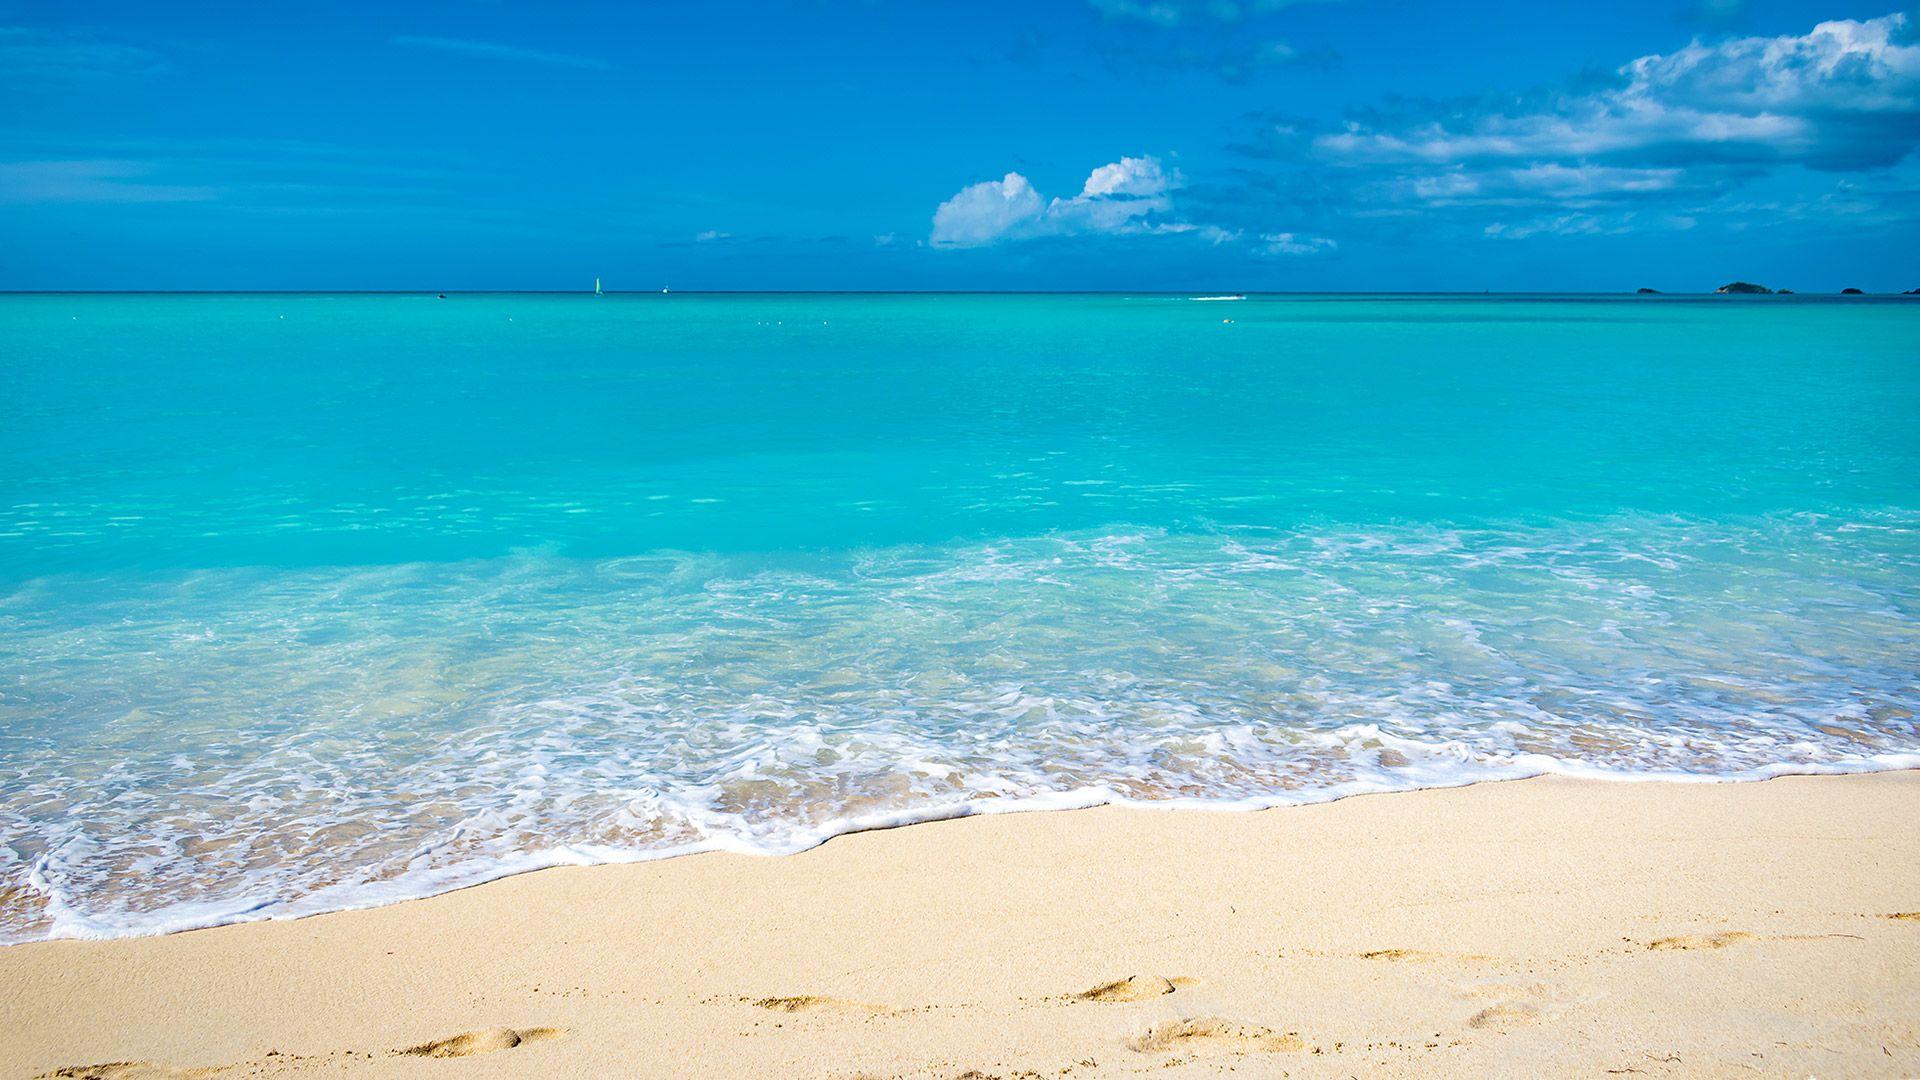 Sejur plaja Punta Cana, Republica Dominicana 10 zile - 3 ianuarie 2022